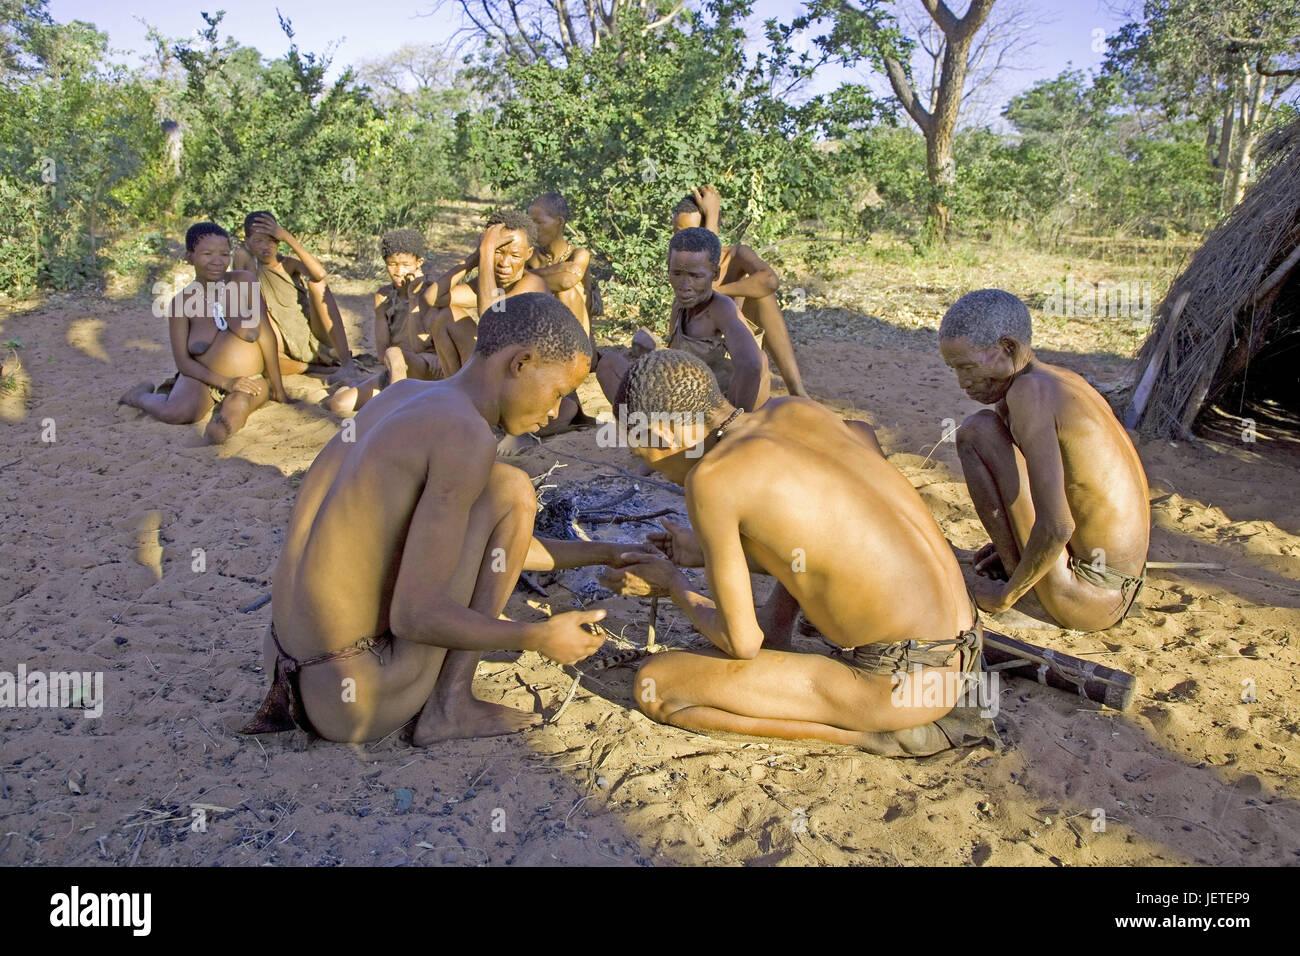 Namibia, Kalahari, bushman's country, bushman's settlement, Grashoek, bushmen, campfires, no model release, - Stock Image